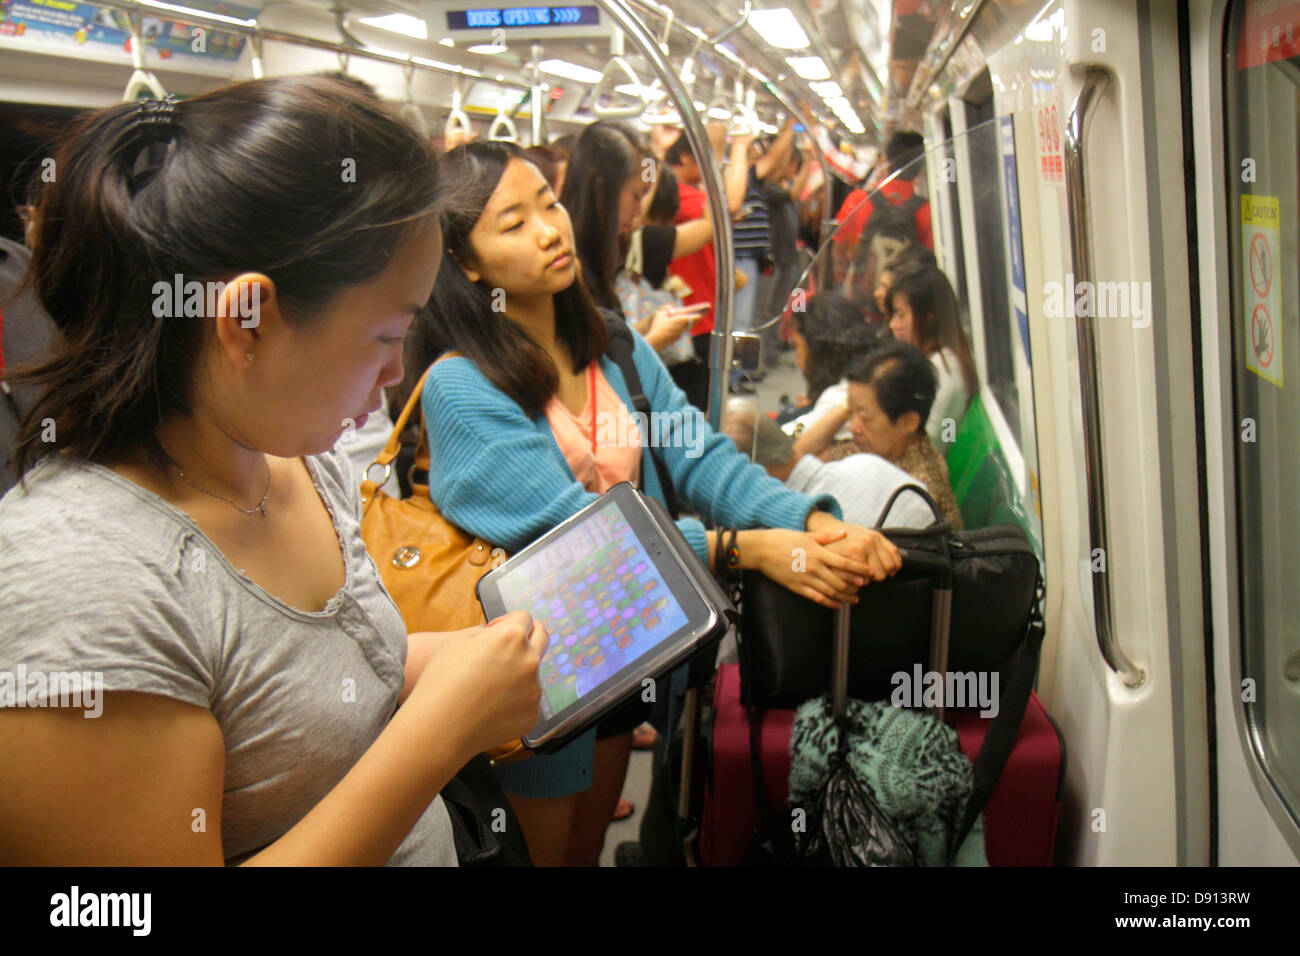 Asian girl in public